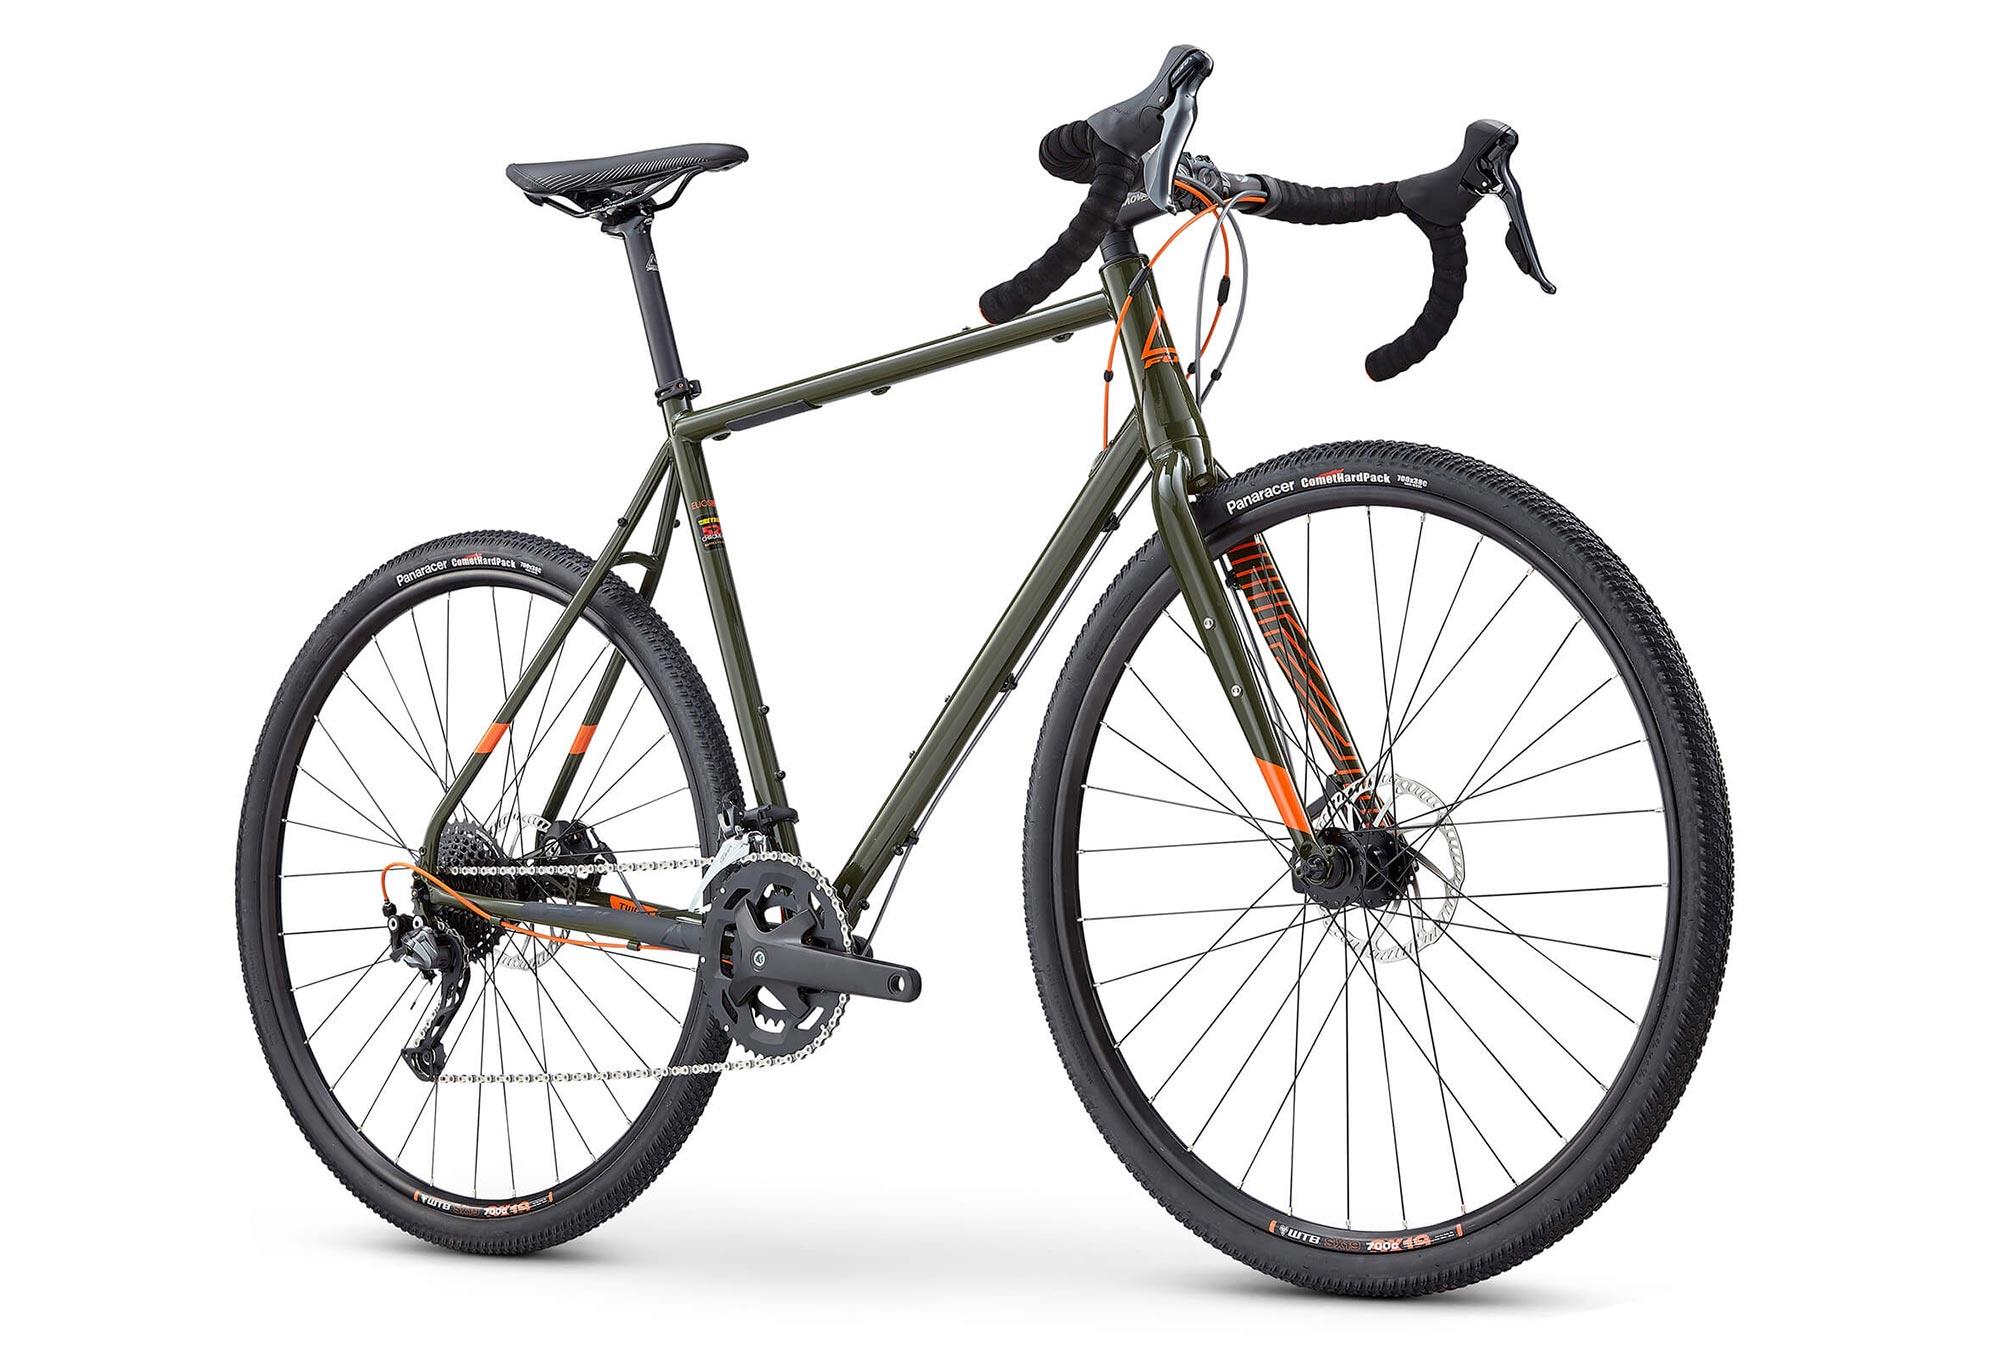 Fuji Jari Steel 2.3 Gravel Bike Shimano Sora 9S 2019 Khaki